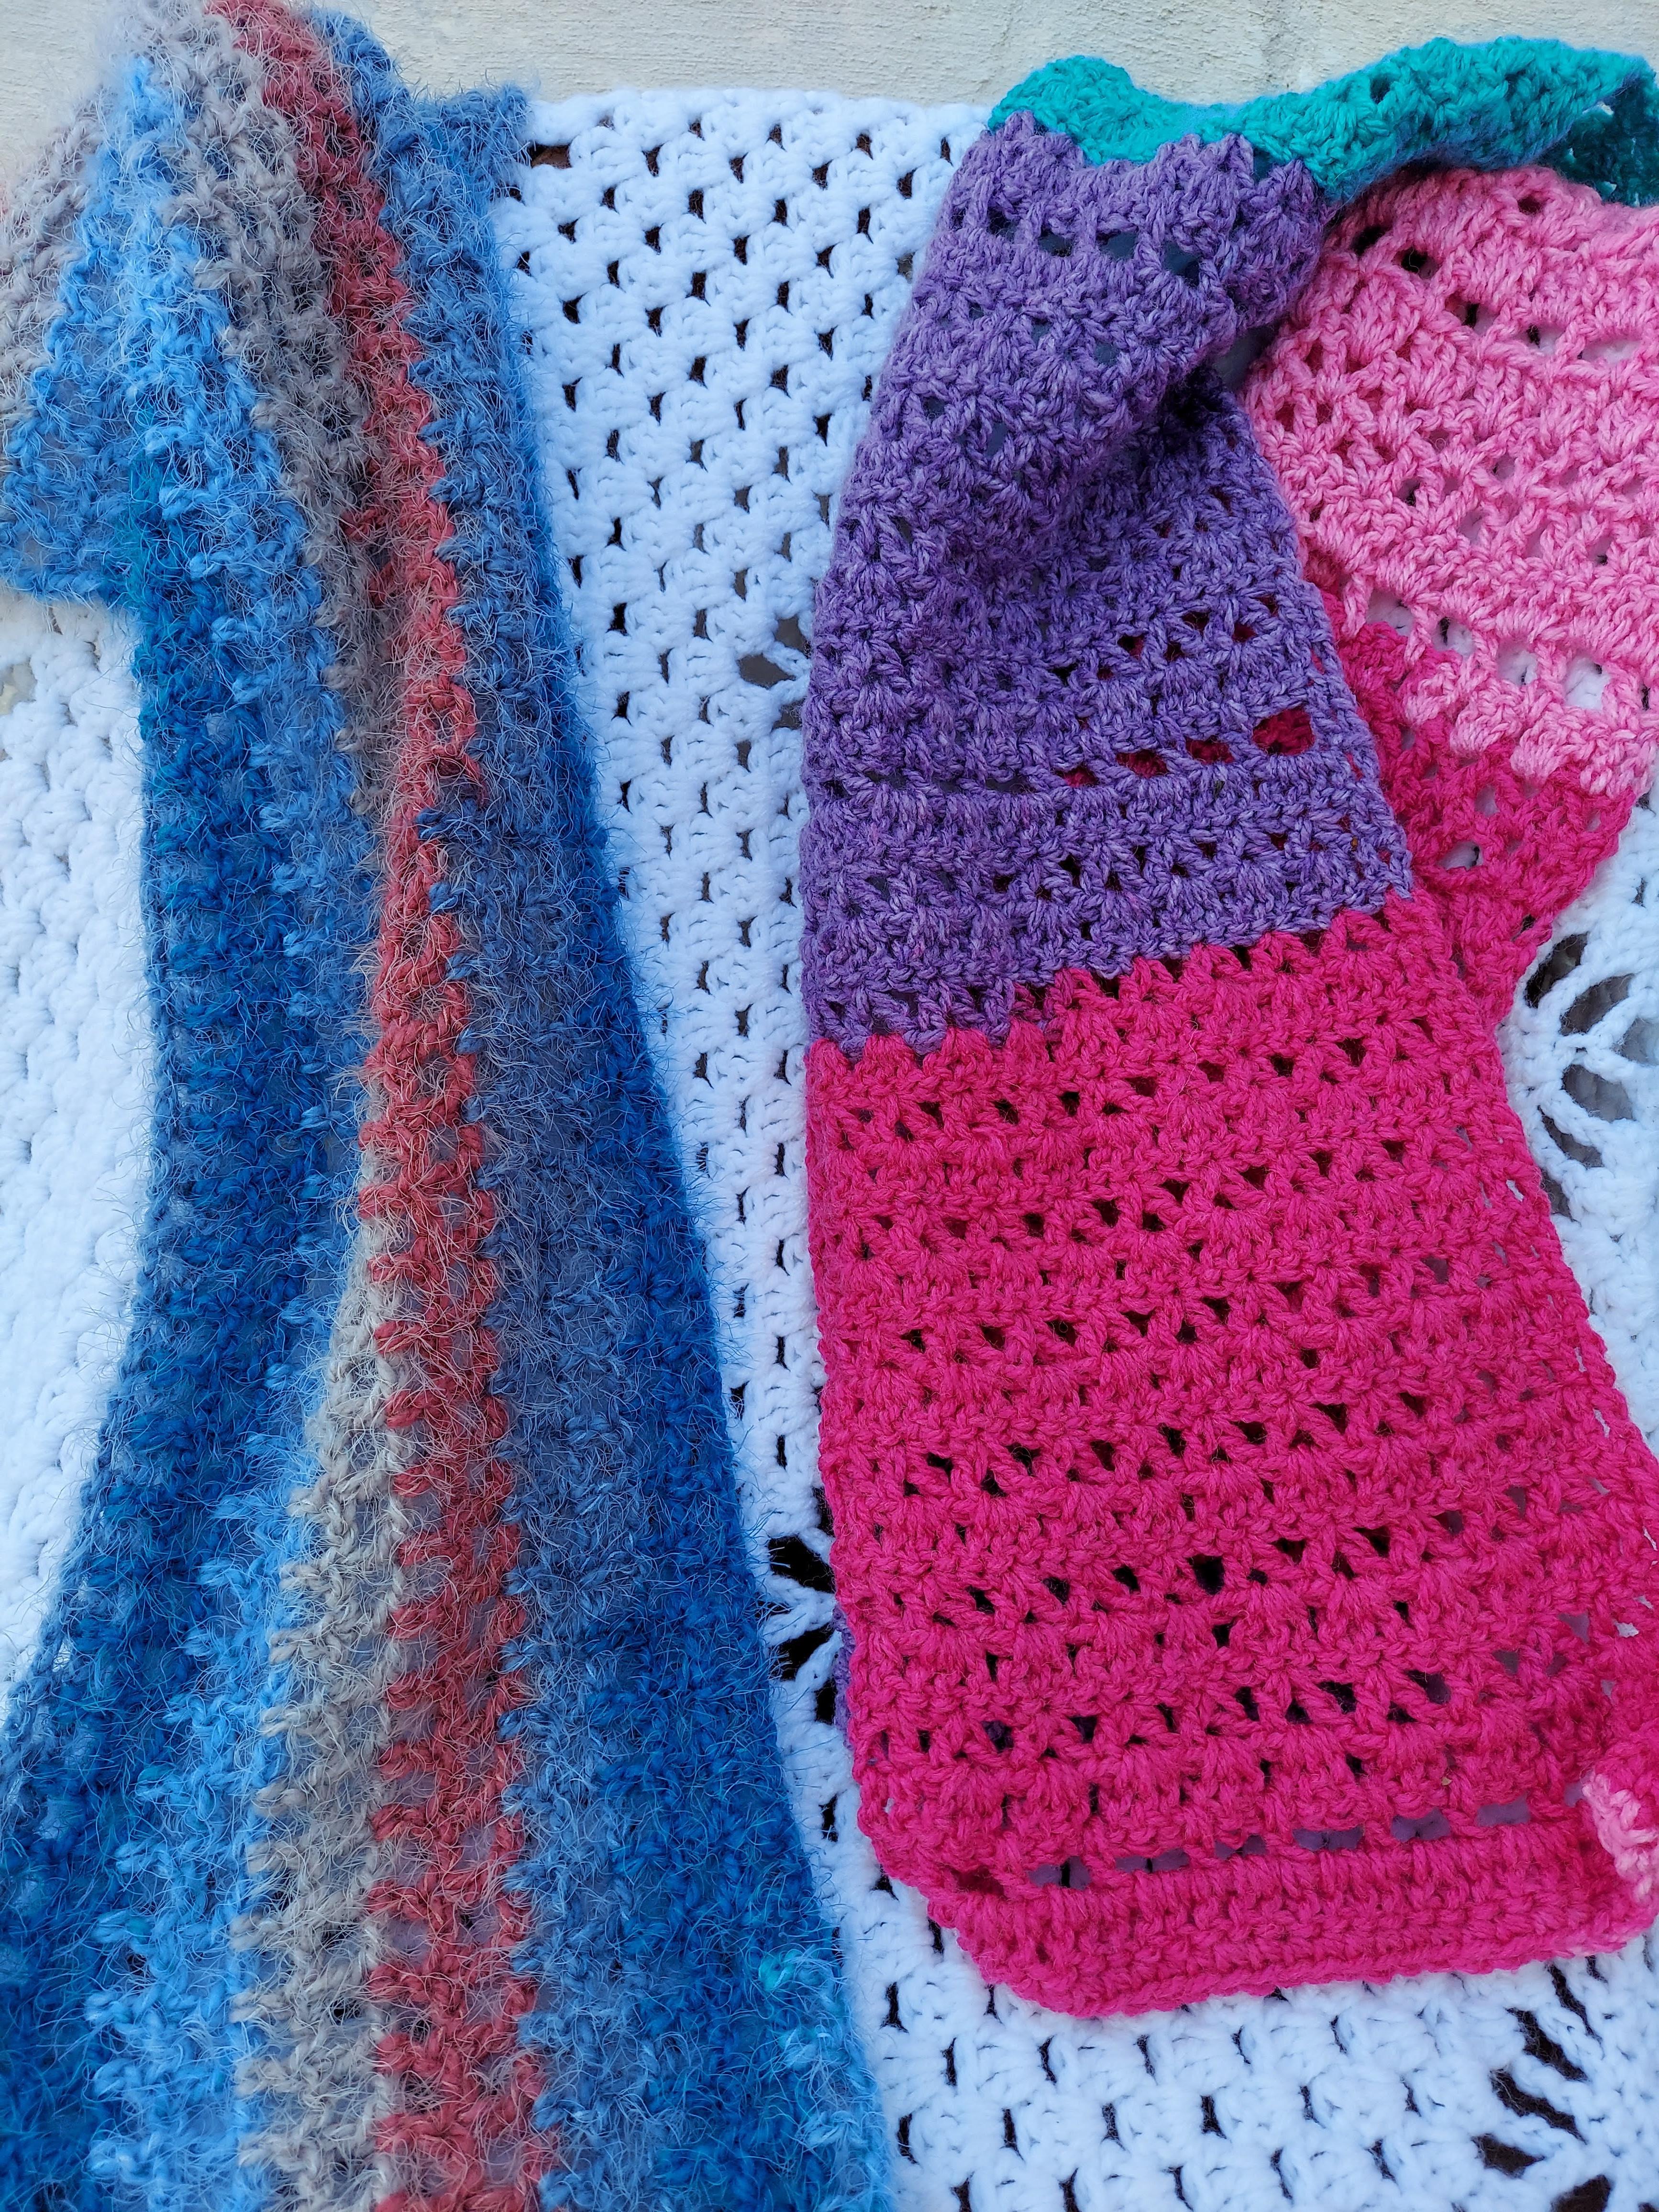 Beginning Crochet for Adults